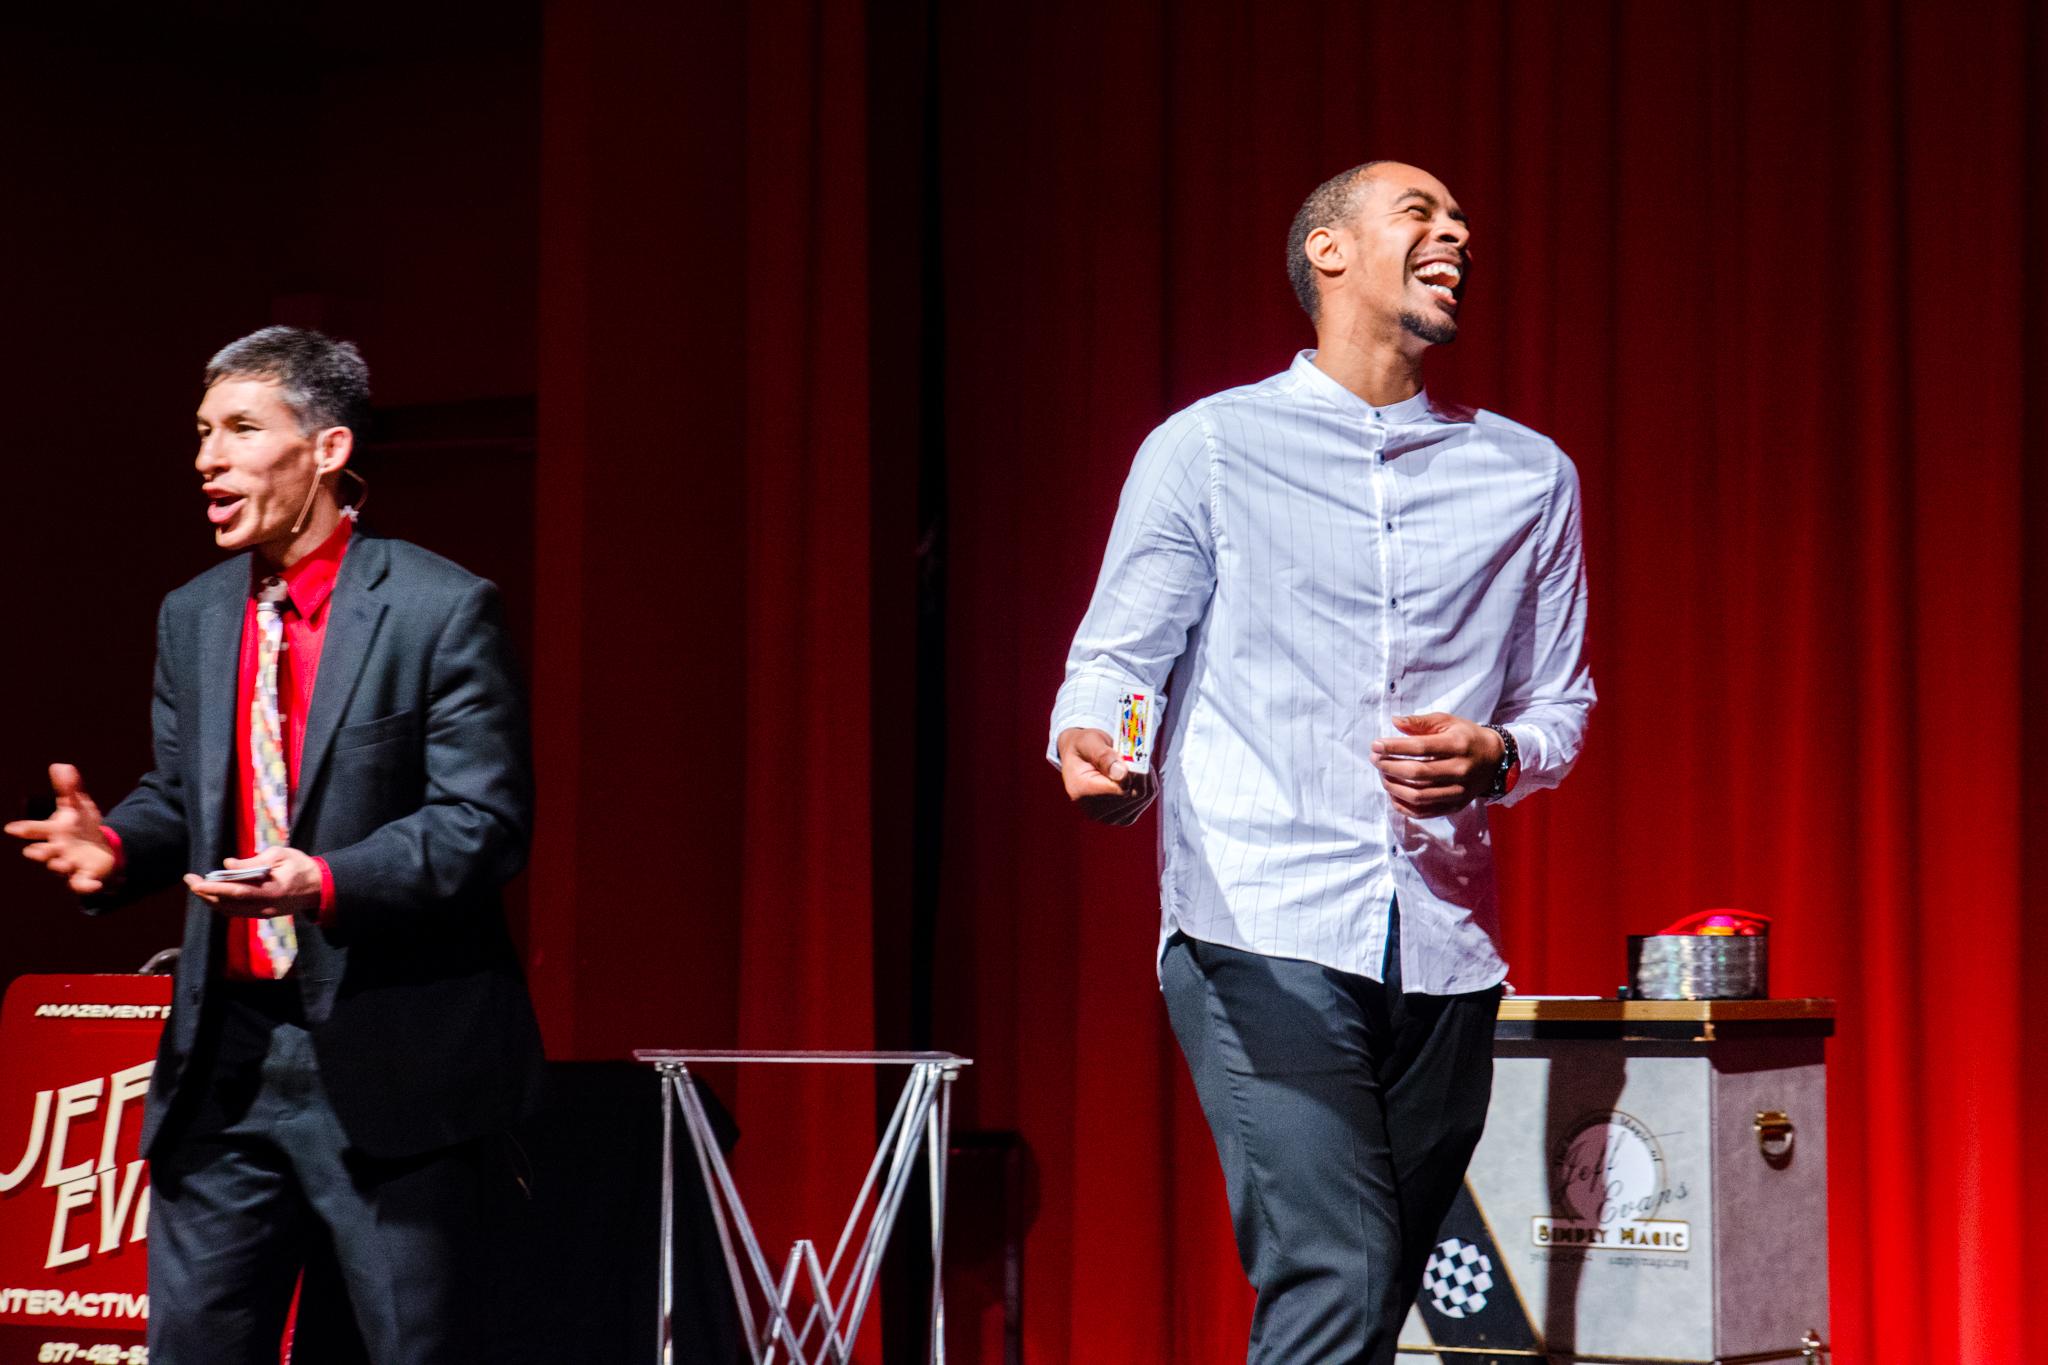 Tacoma banqet magician Jeff Evans: clean comedy and interactive magic